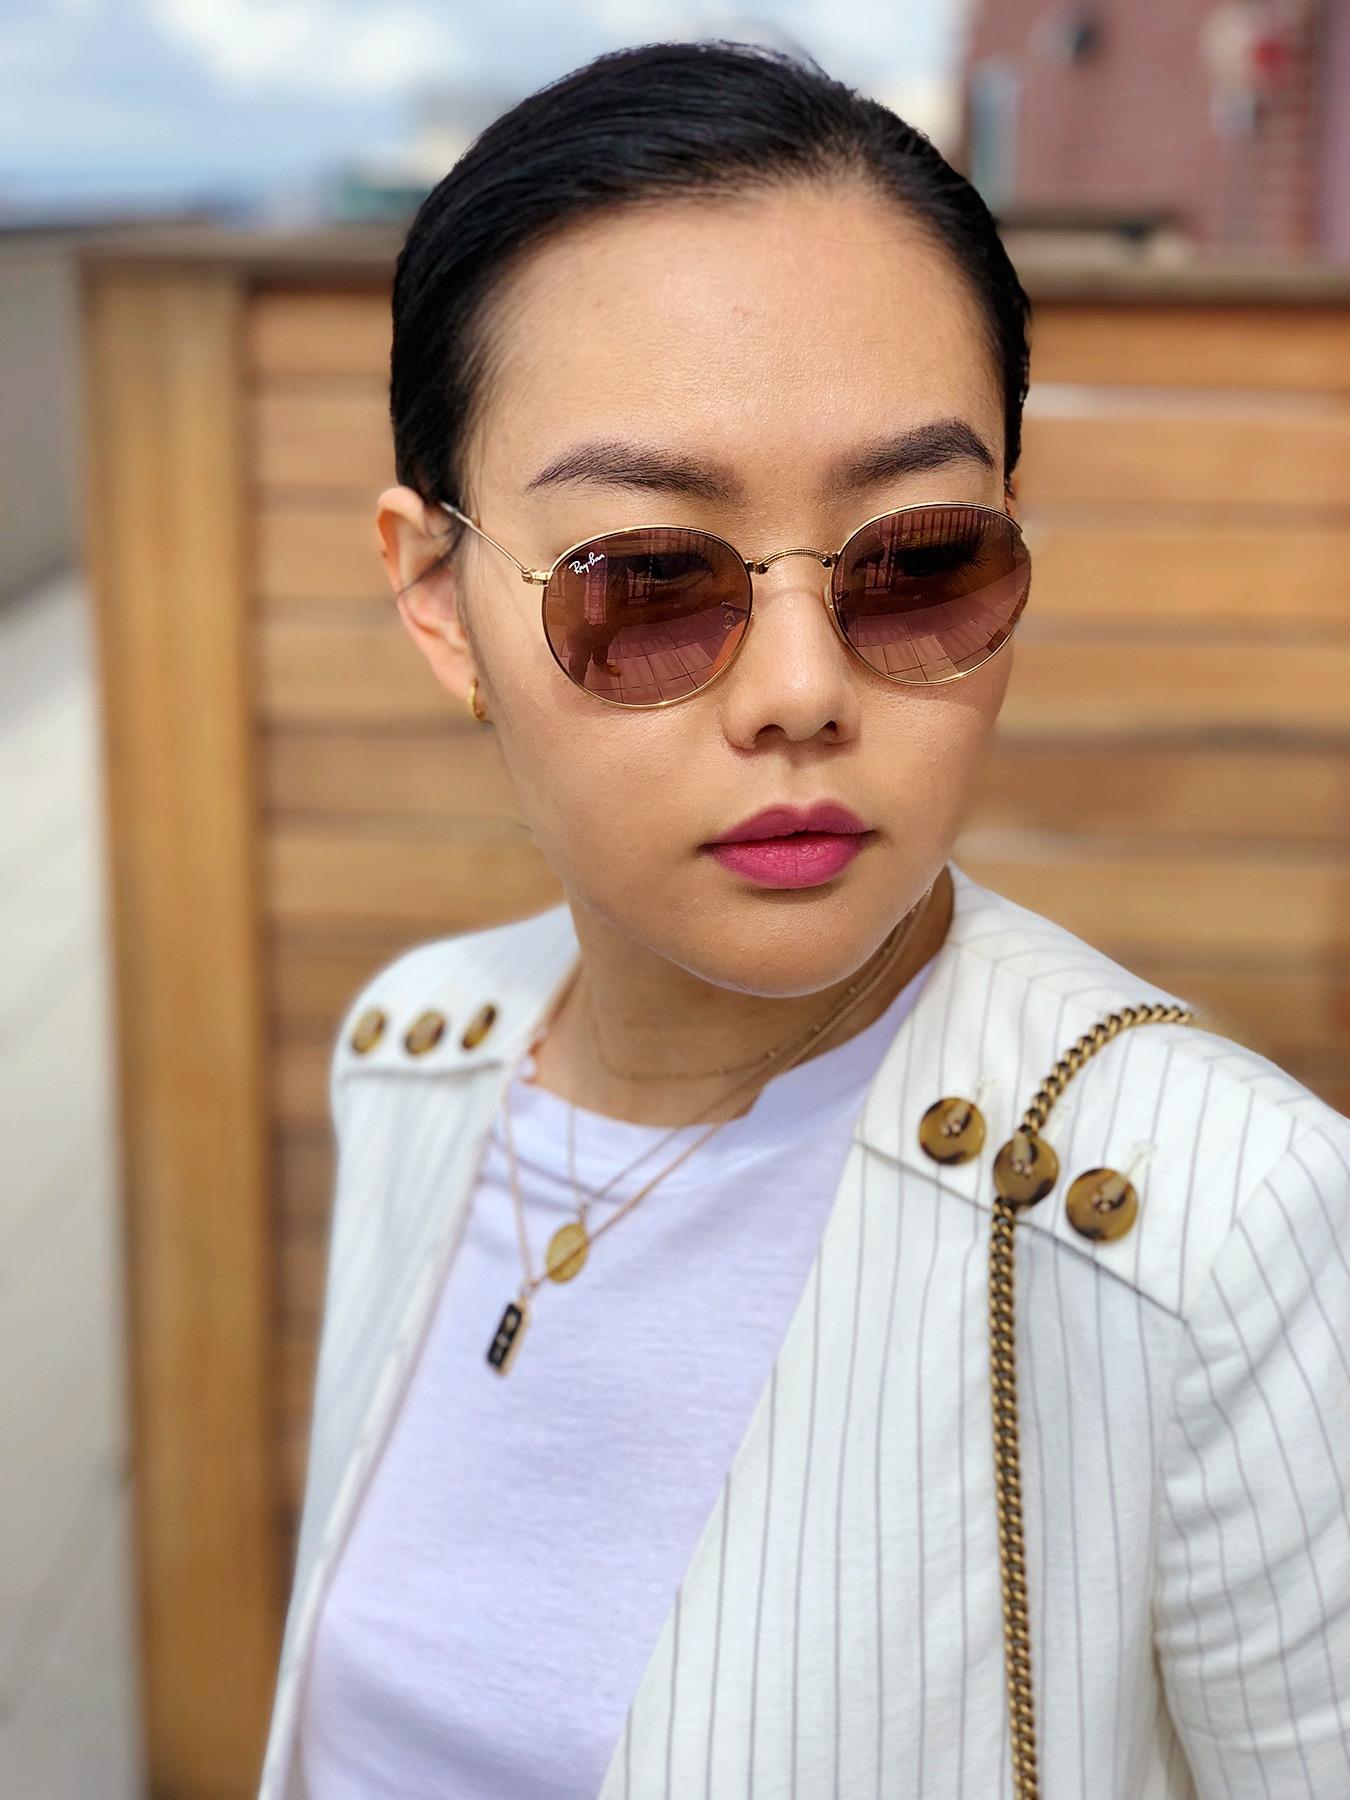 My Sunglasses Collection - Rayban Round